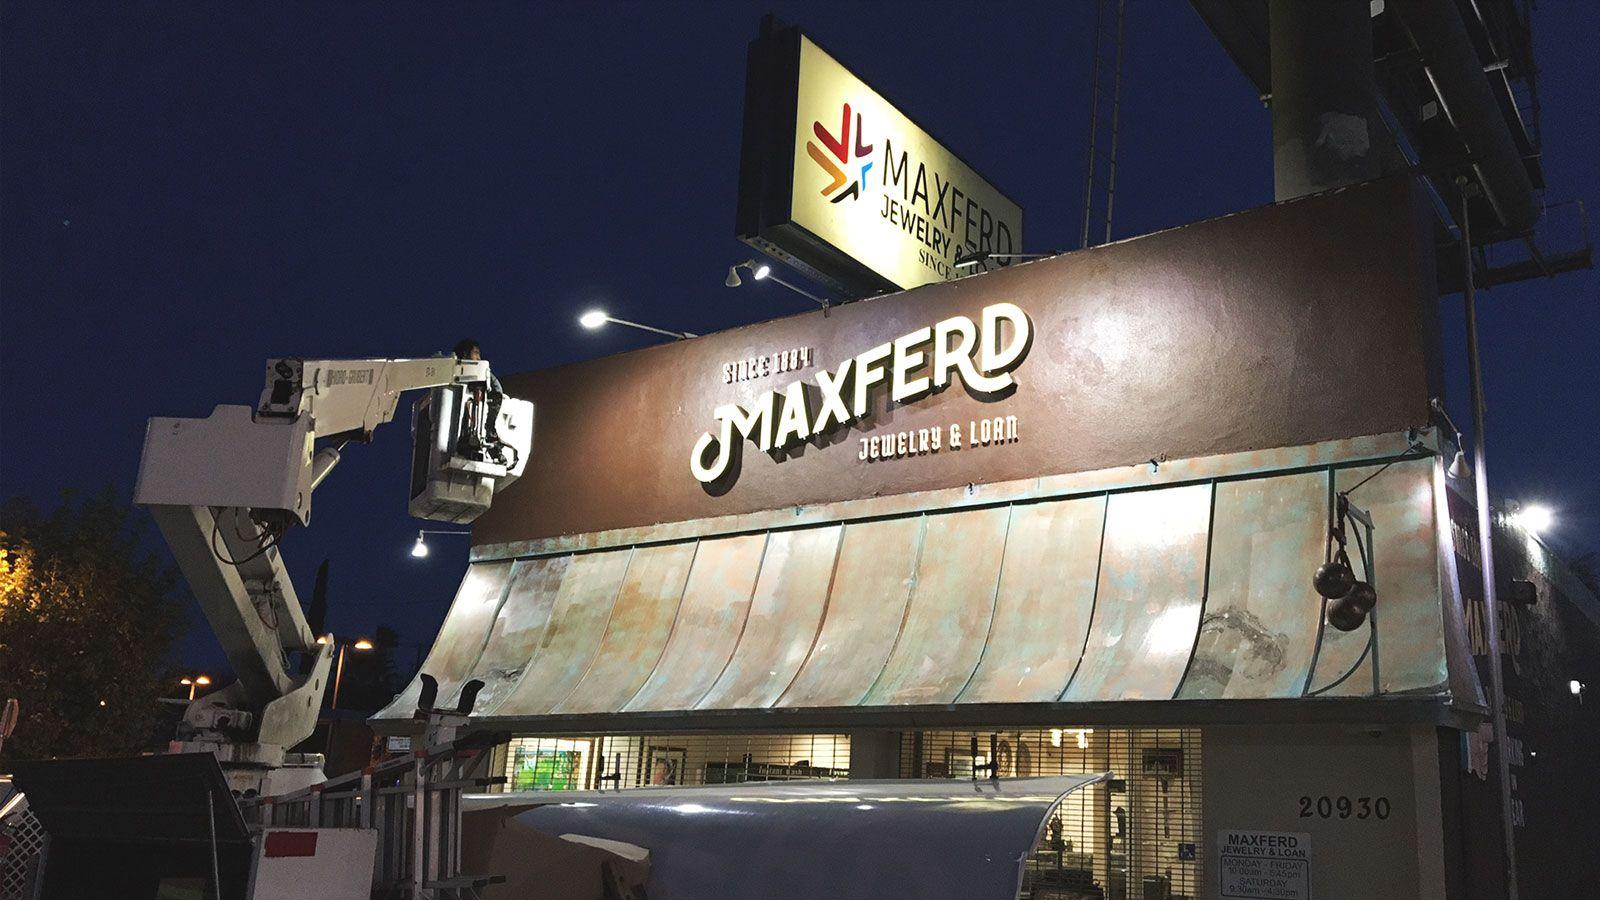 Maxferd storefront sign installation